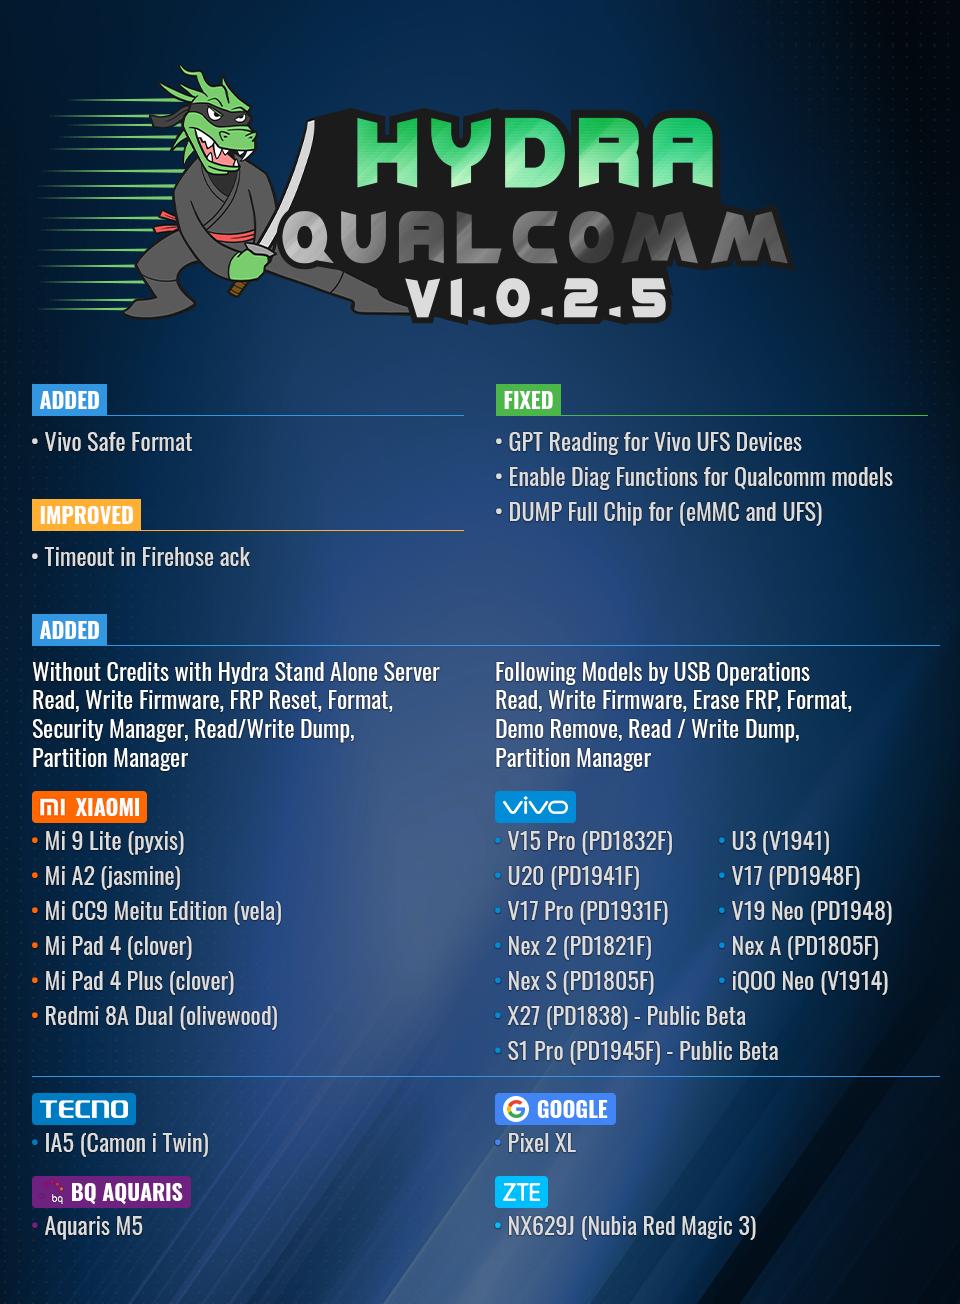 Hydra Qualcomm Module v 1.0.2.5 Xiaomi & Vivo UFS